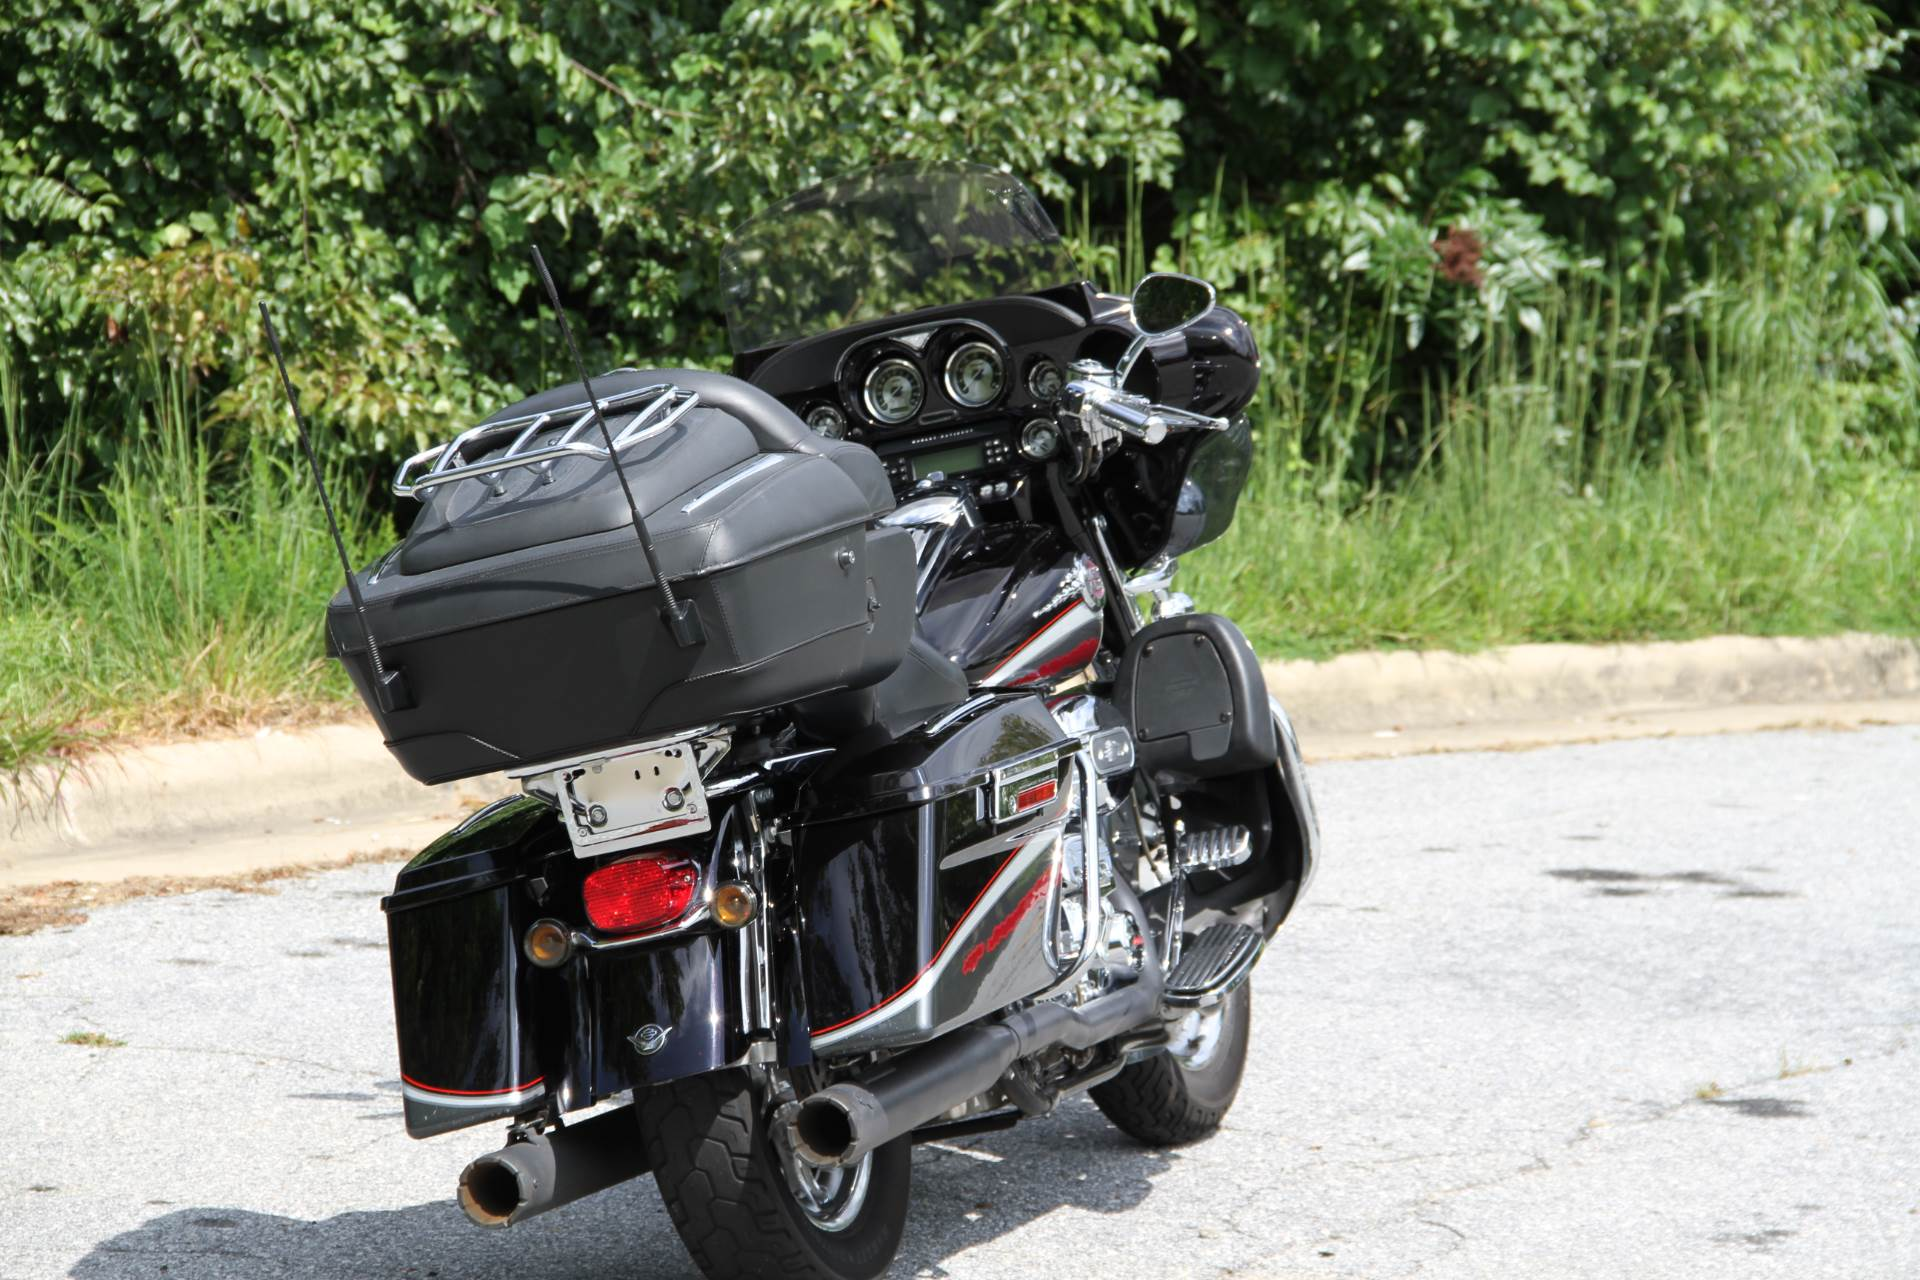 Harley Davidson Barrie Used